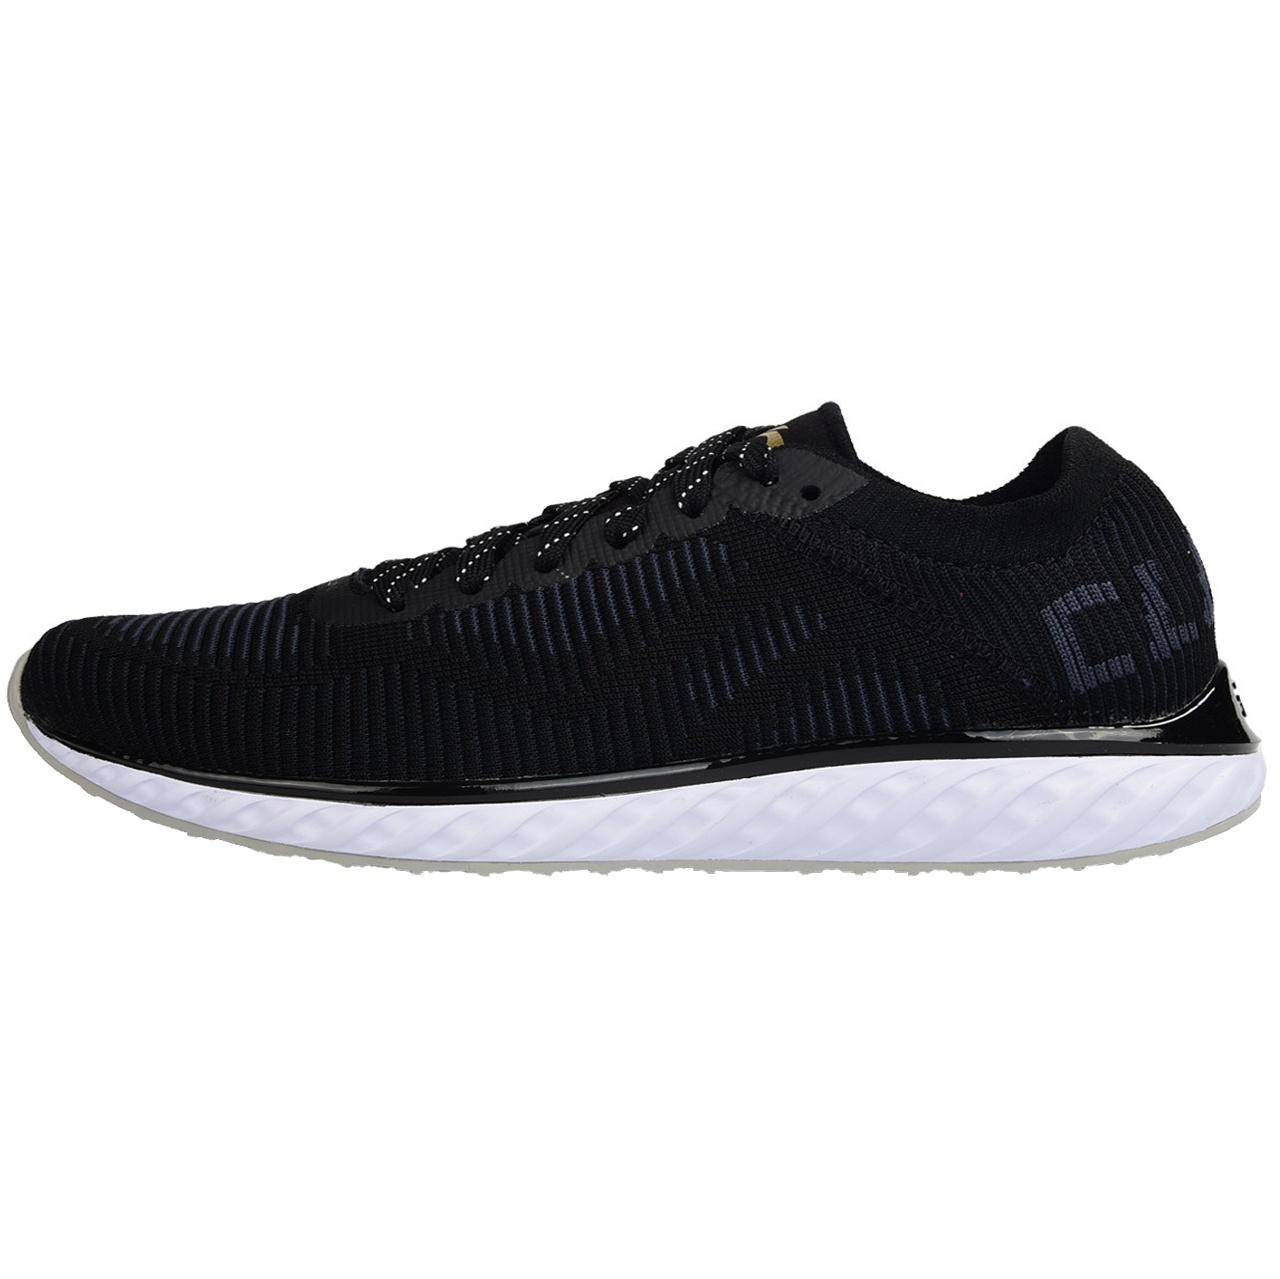 کفش مخصوص دویدن زنانه لینینگ کد ARHM034-11